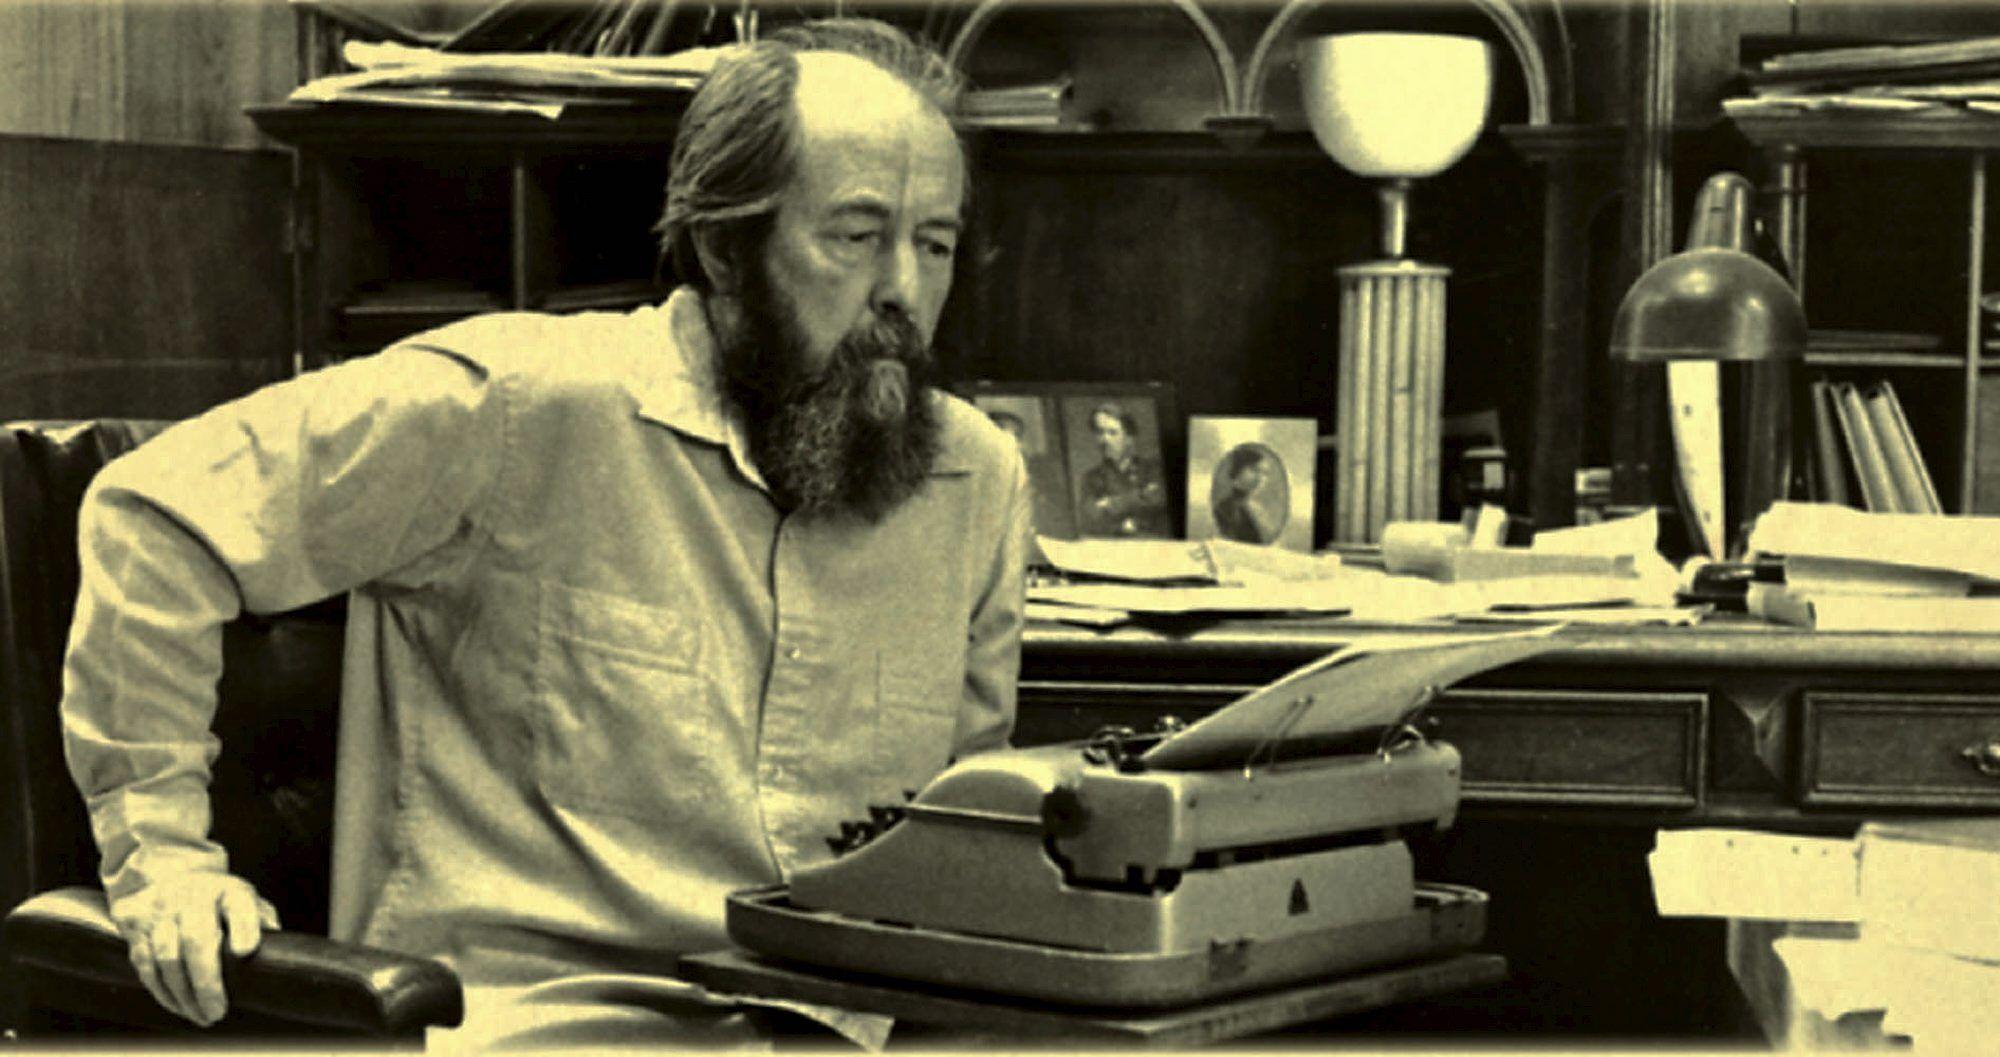 Discurso de Alexander Solzhenitsyn en Harvard